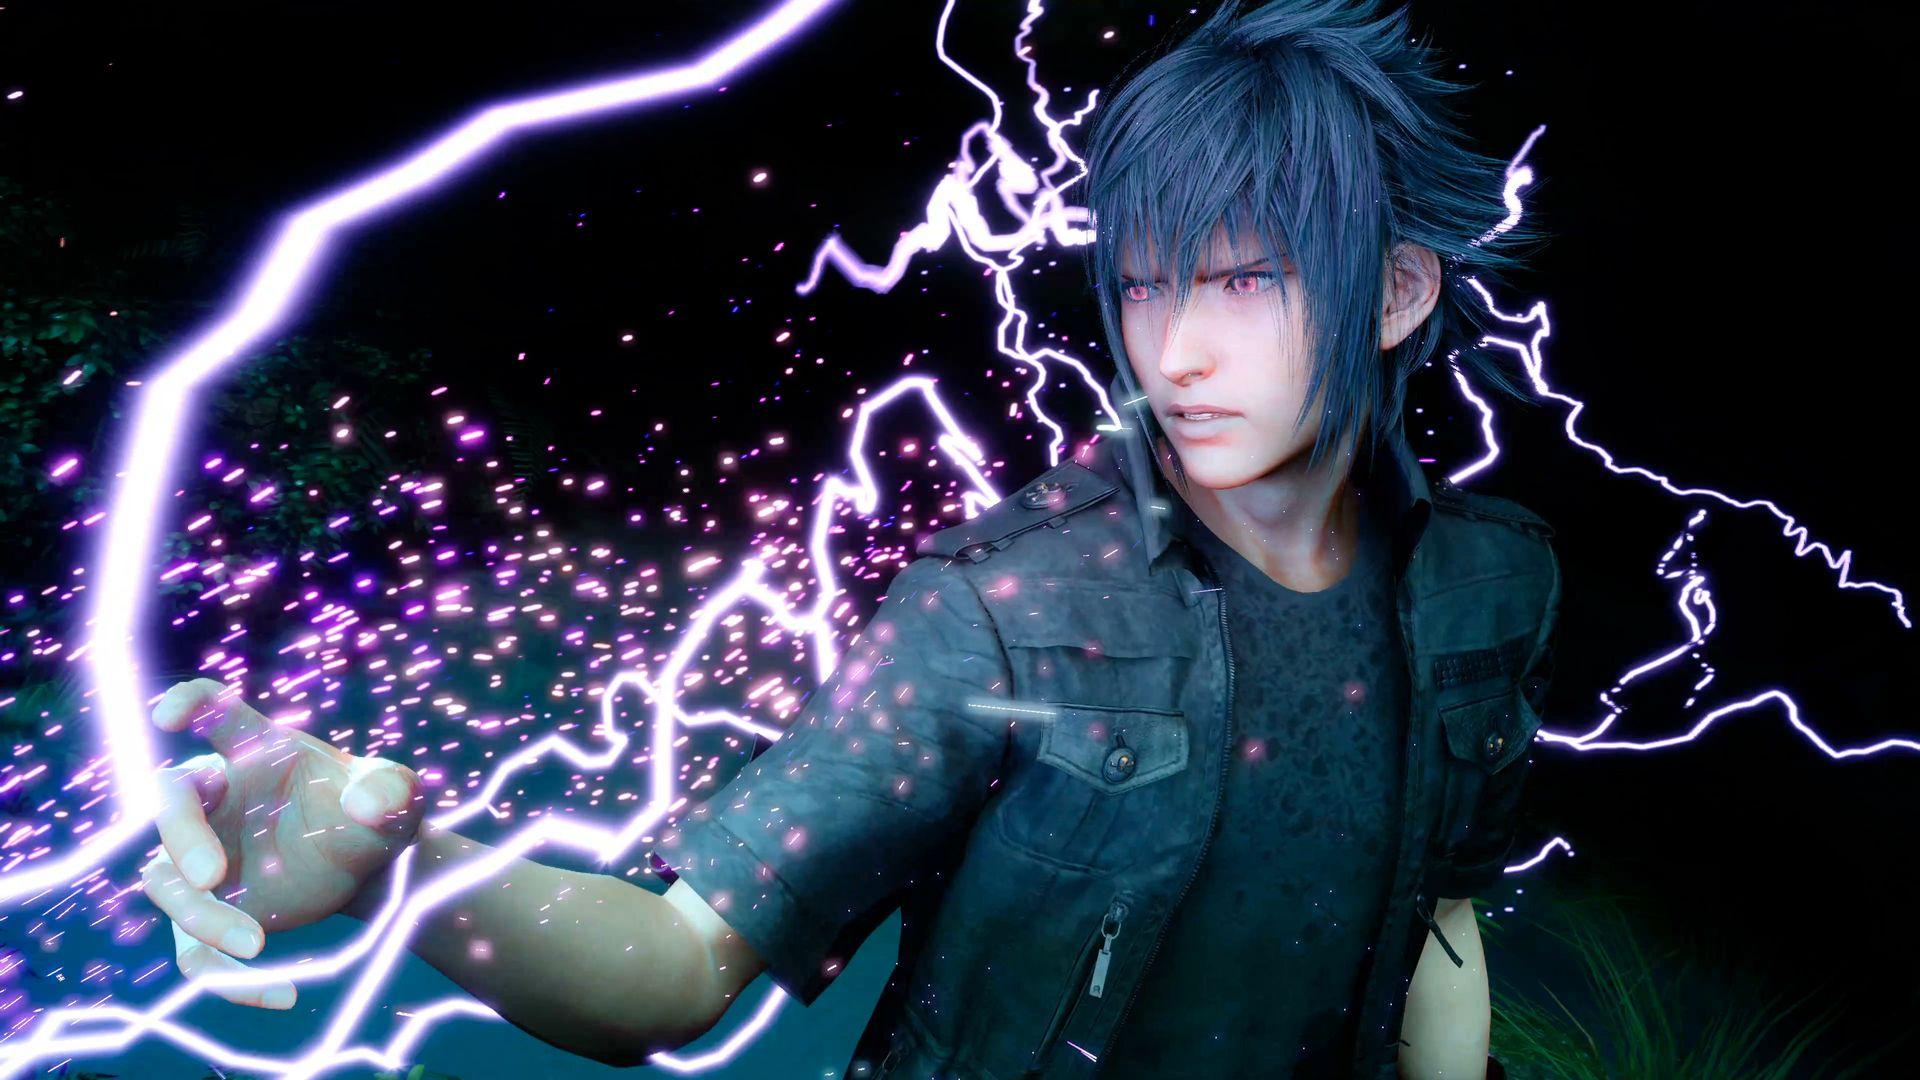 2048x1152 Noctis Lucis Caelum Final Fantasy Xv 4k: Final Fantasy XV Windows Edition Review